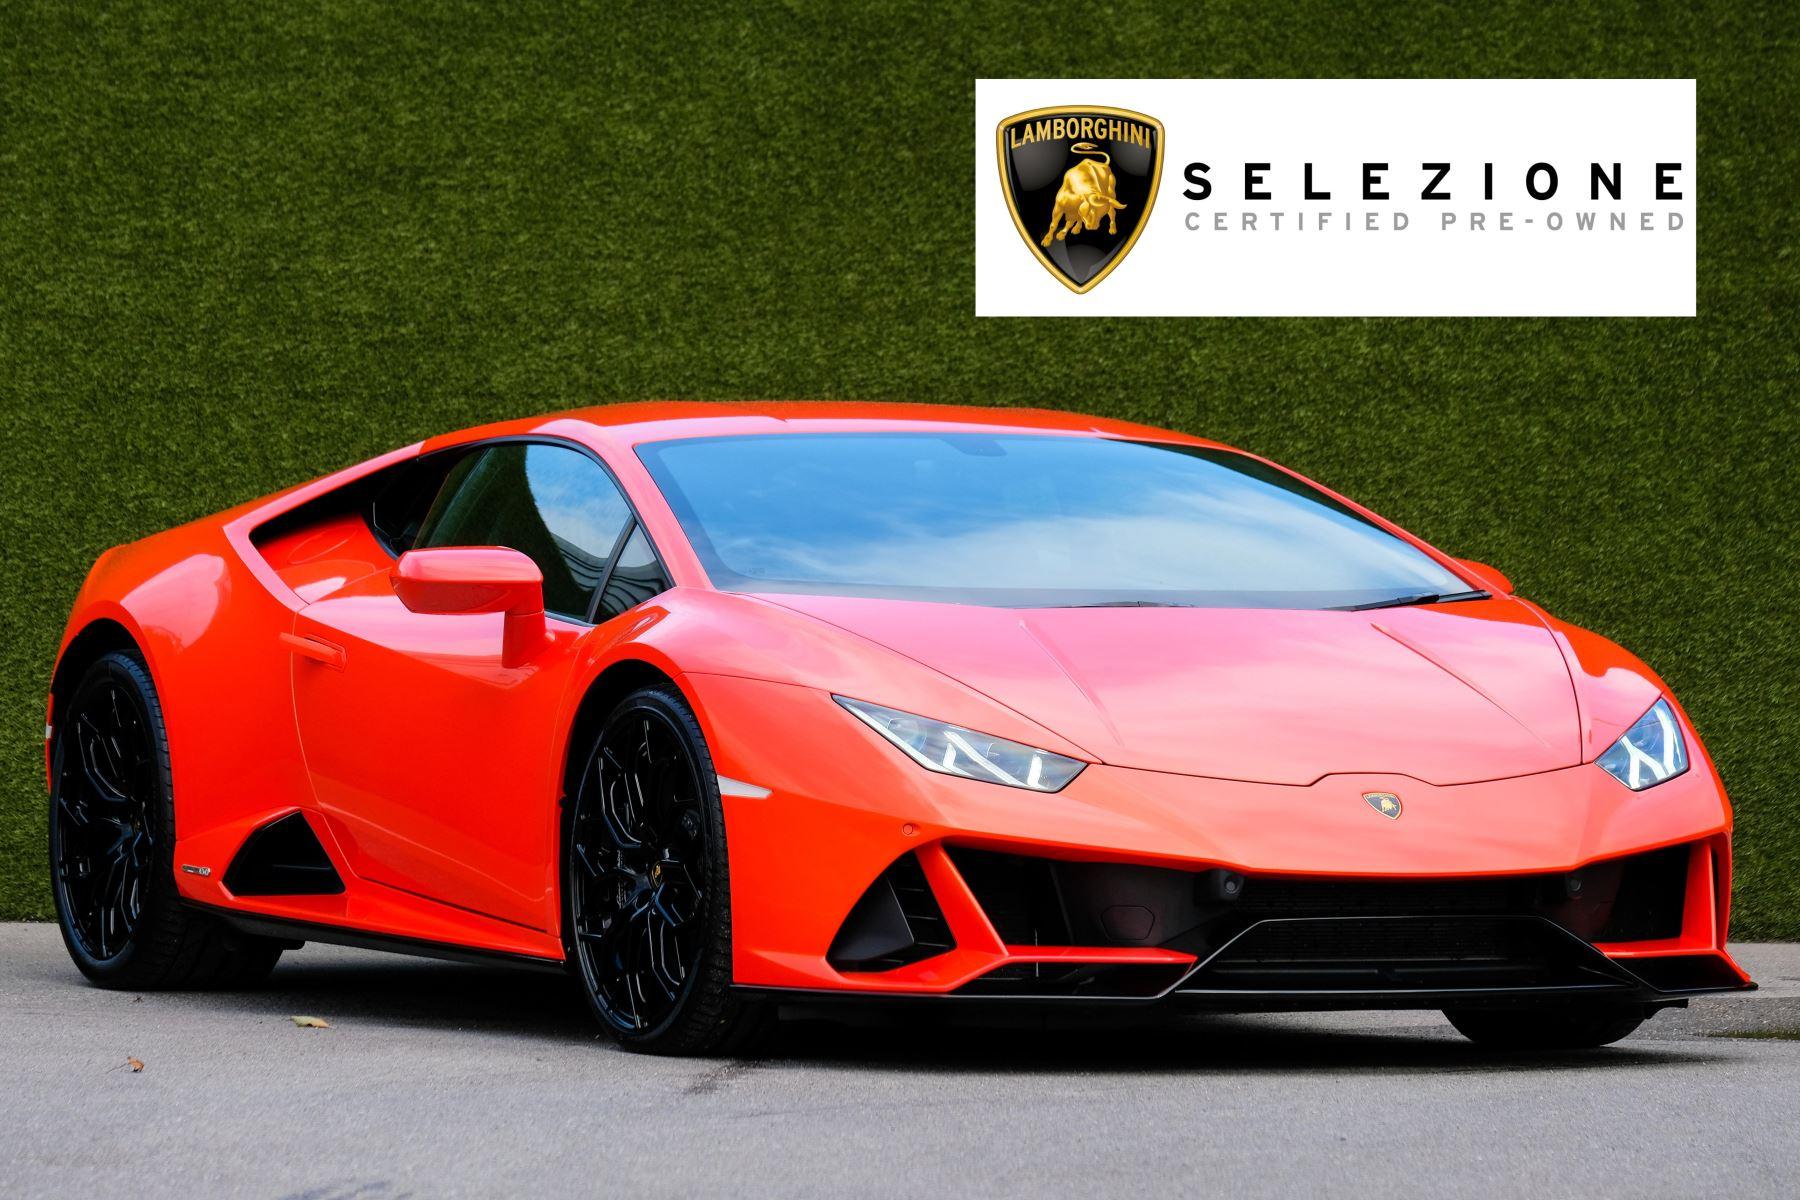 Lamborghini Huracan 5.2 V10 640 AWD Automatic 2 door Coupe (2019) image